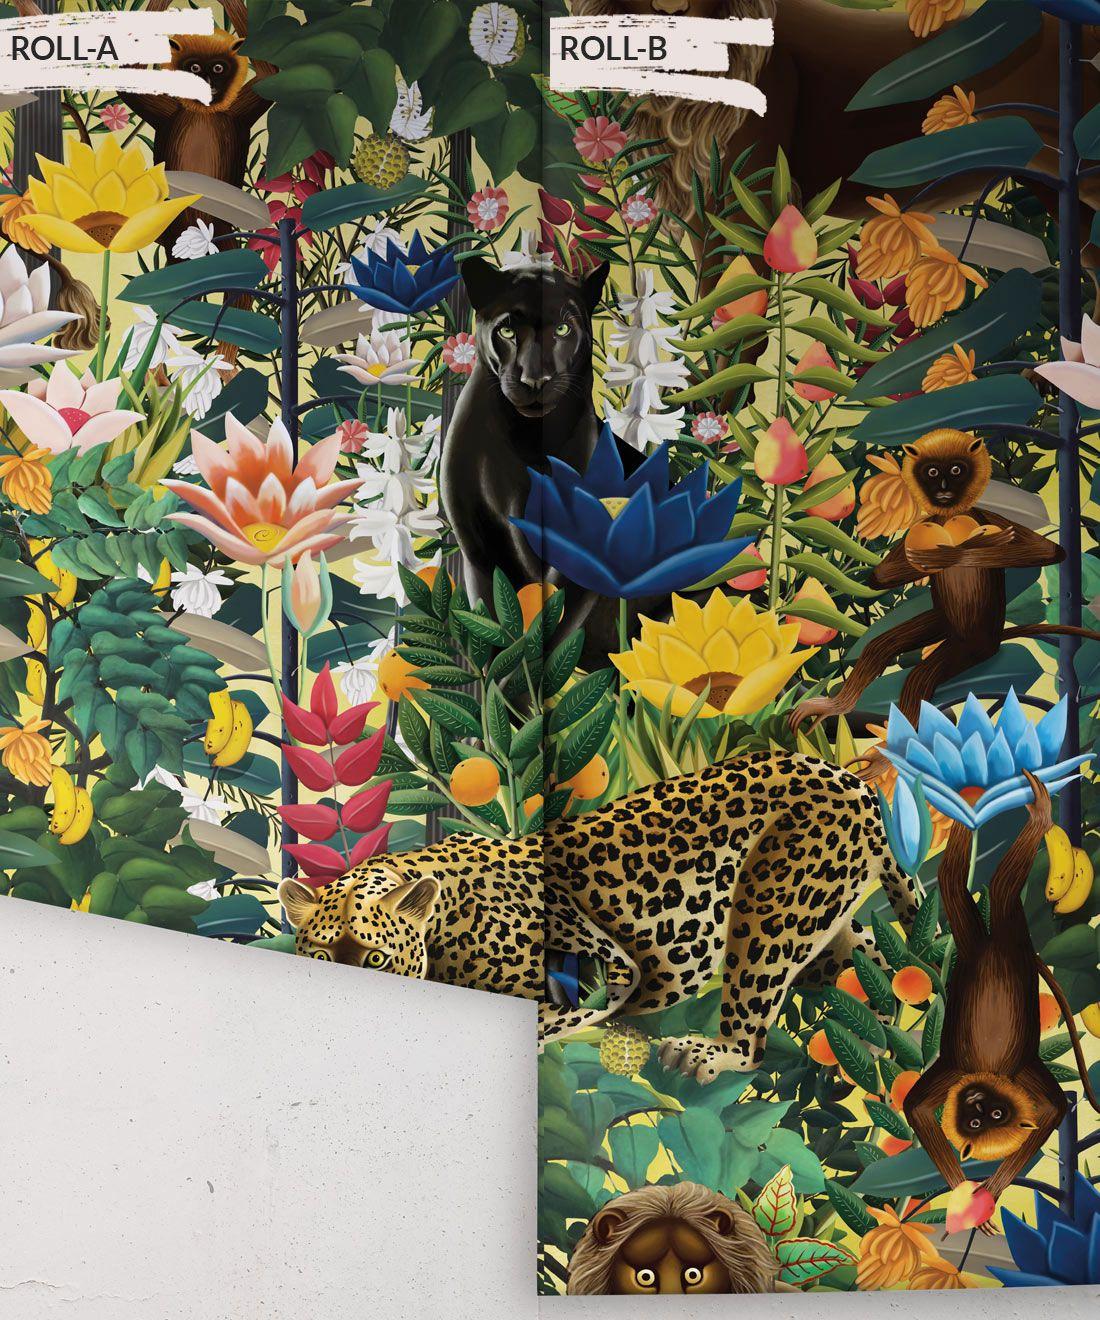 The Jungle Wallpaper • Animal Wallpaper • Botanical Wallpaper • Hazelwood Wallpaper • Rolls